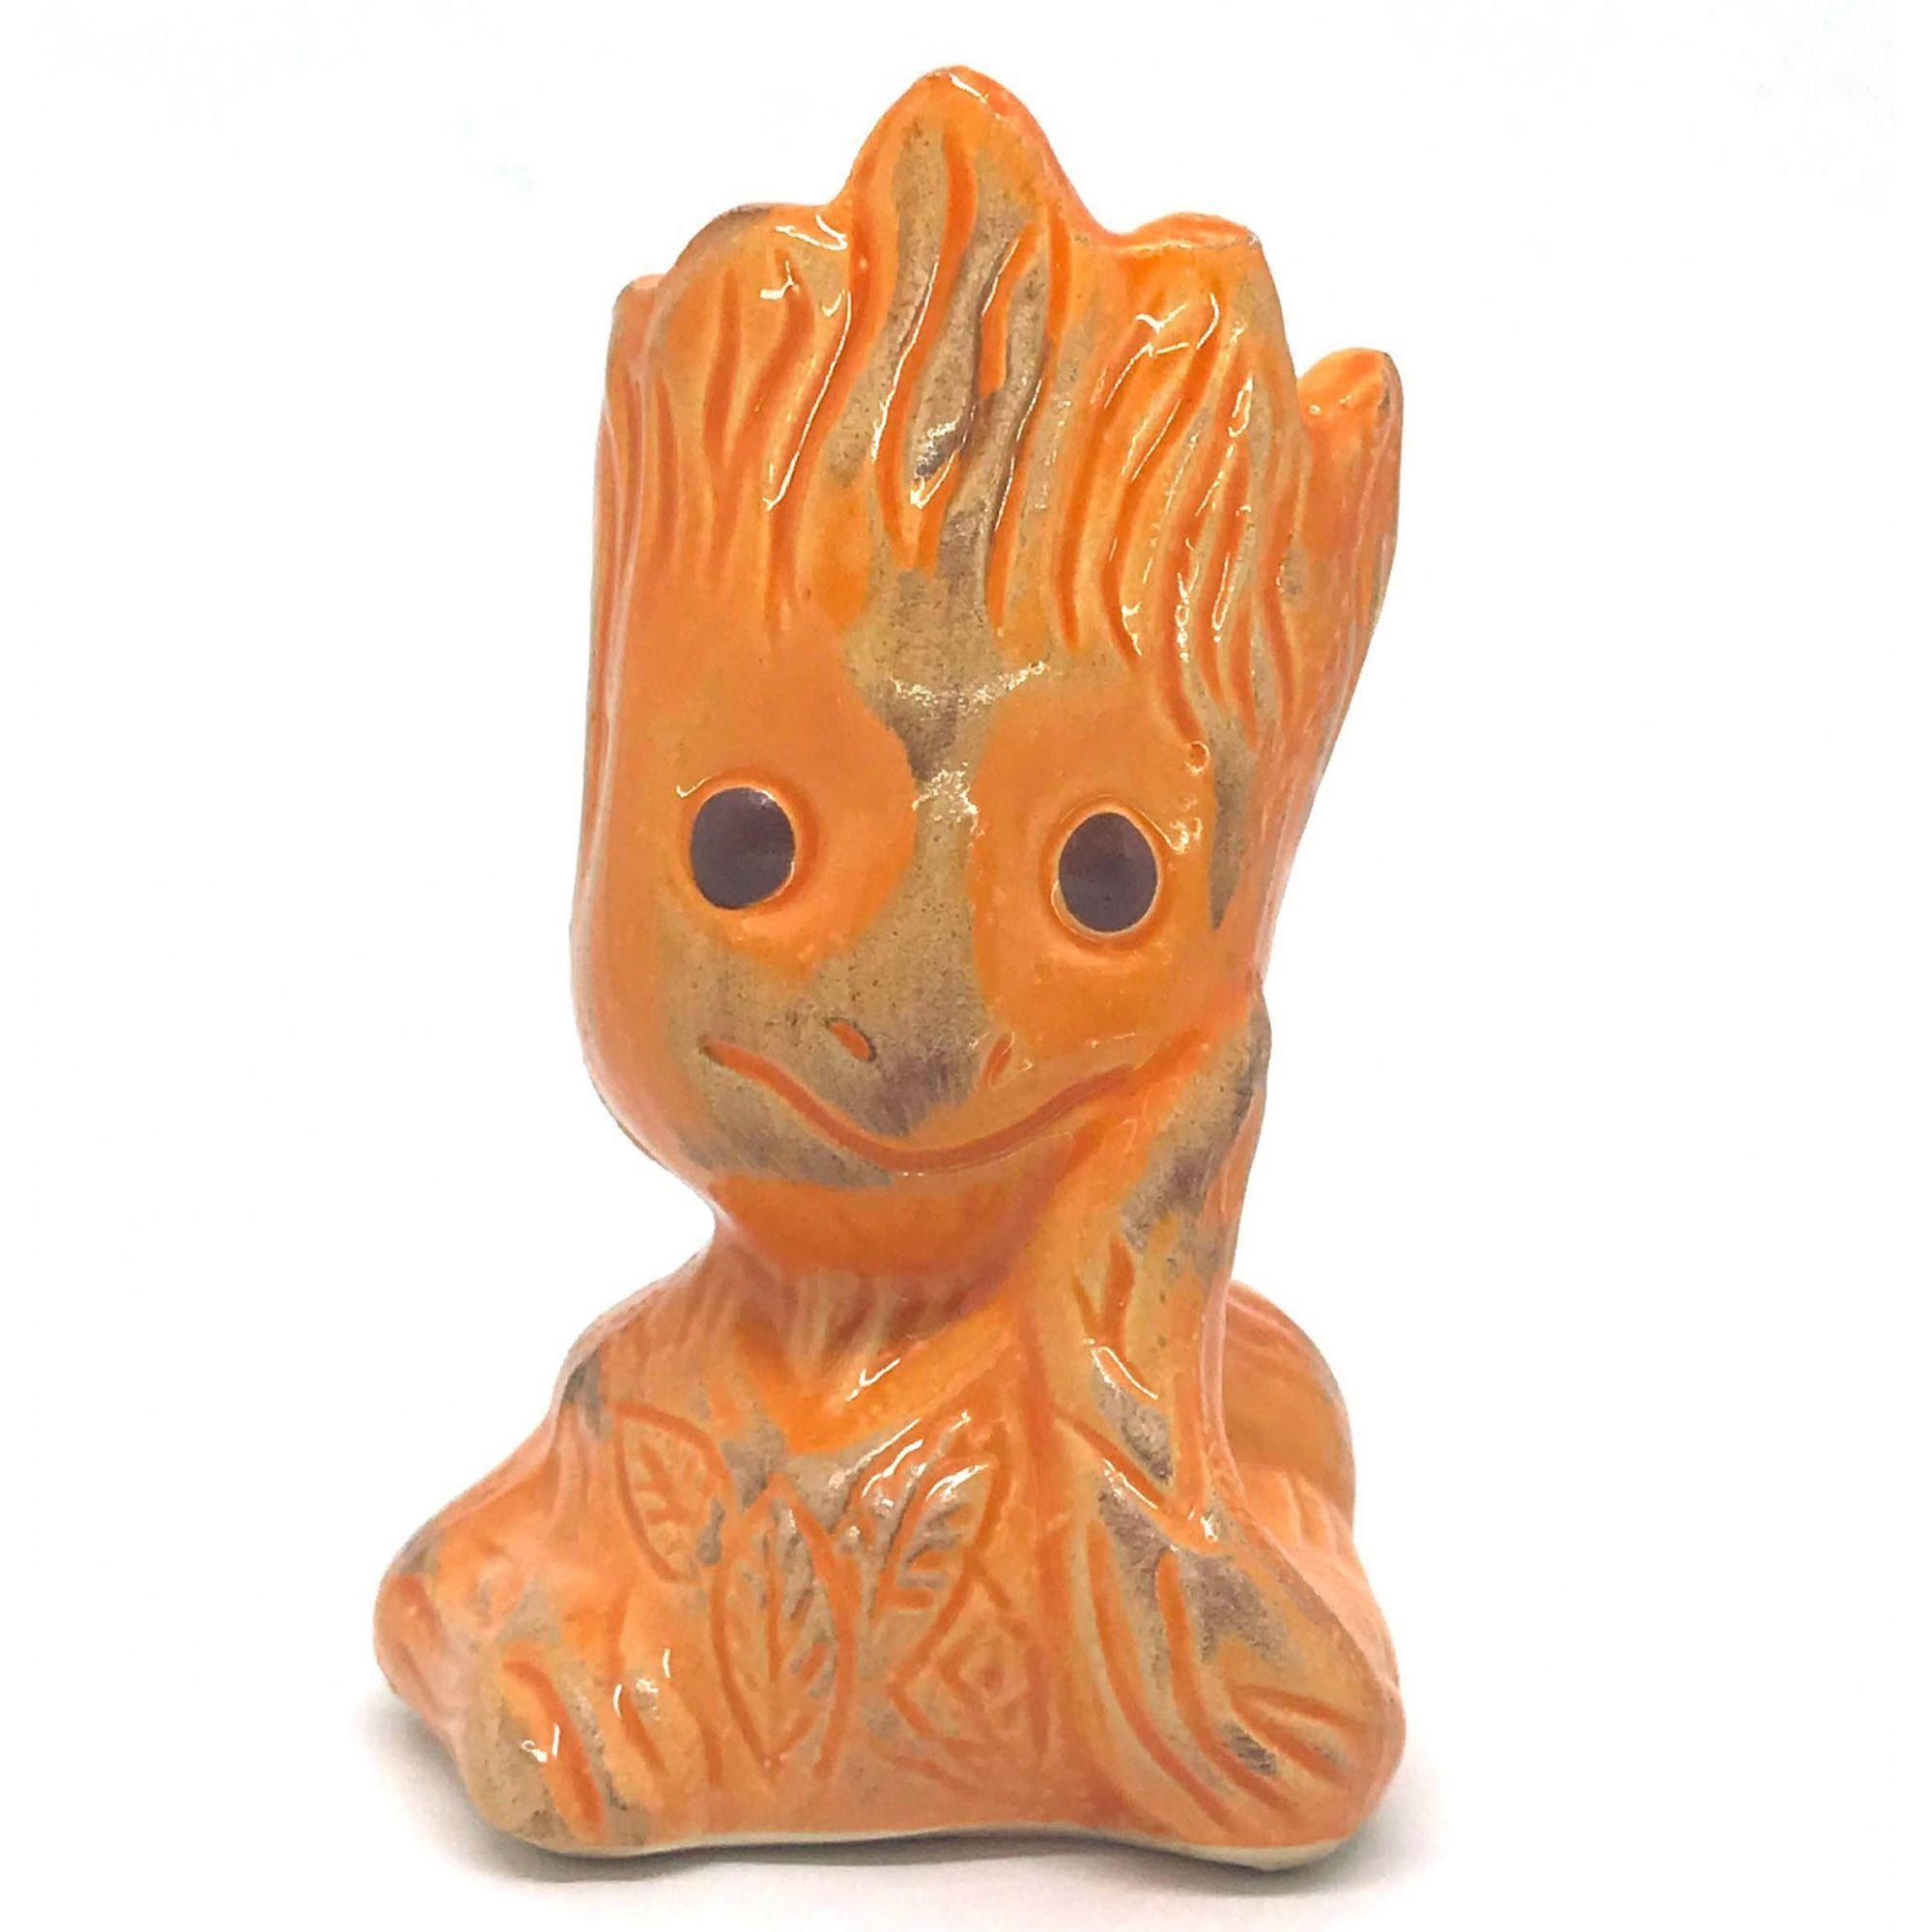 Vaso de Cerâmica Groot Laranja 12cm x 5,5cm